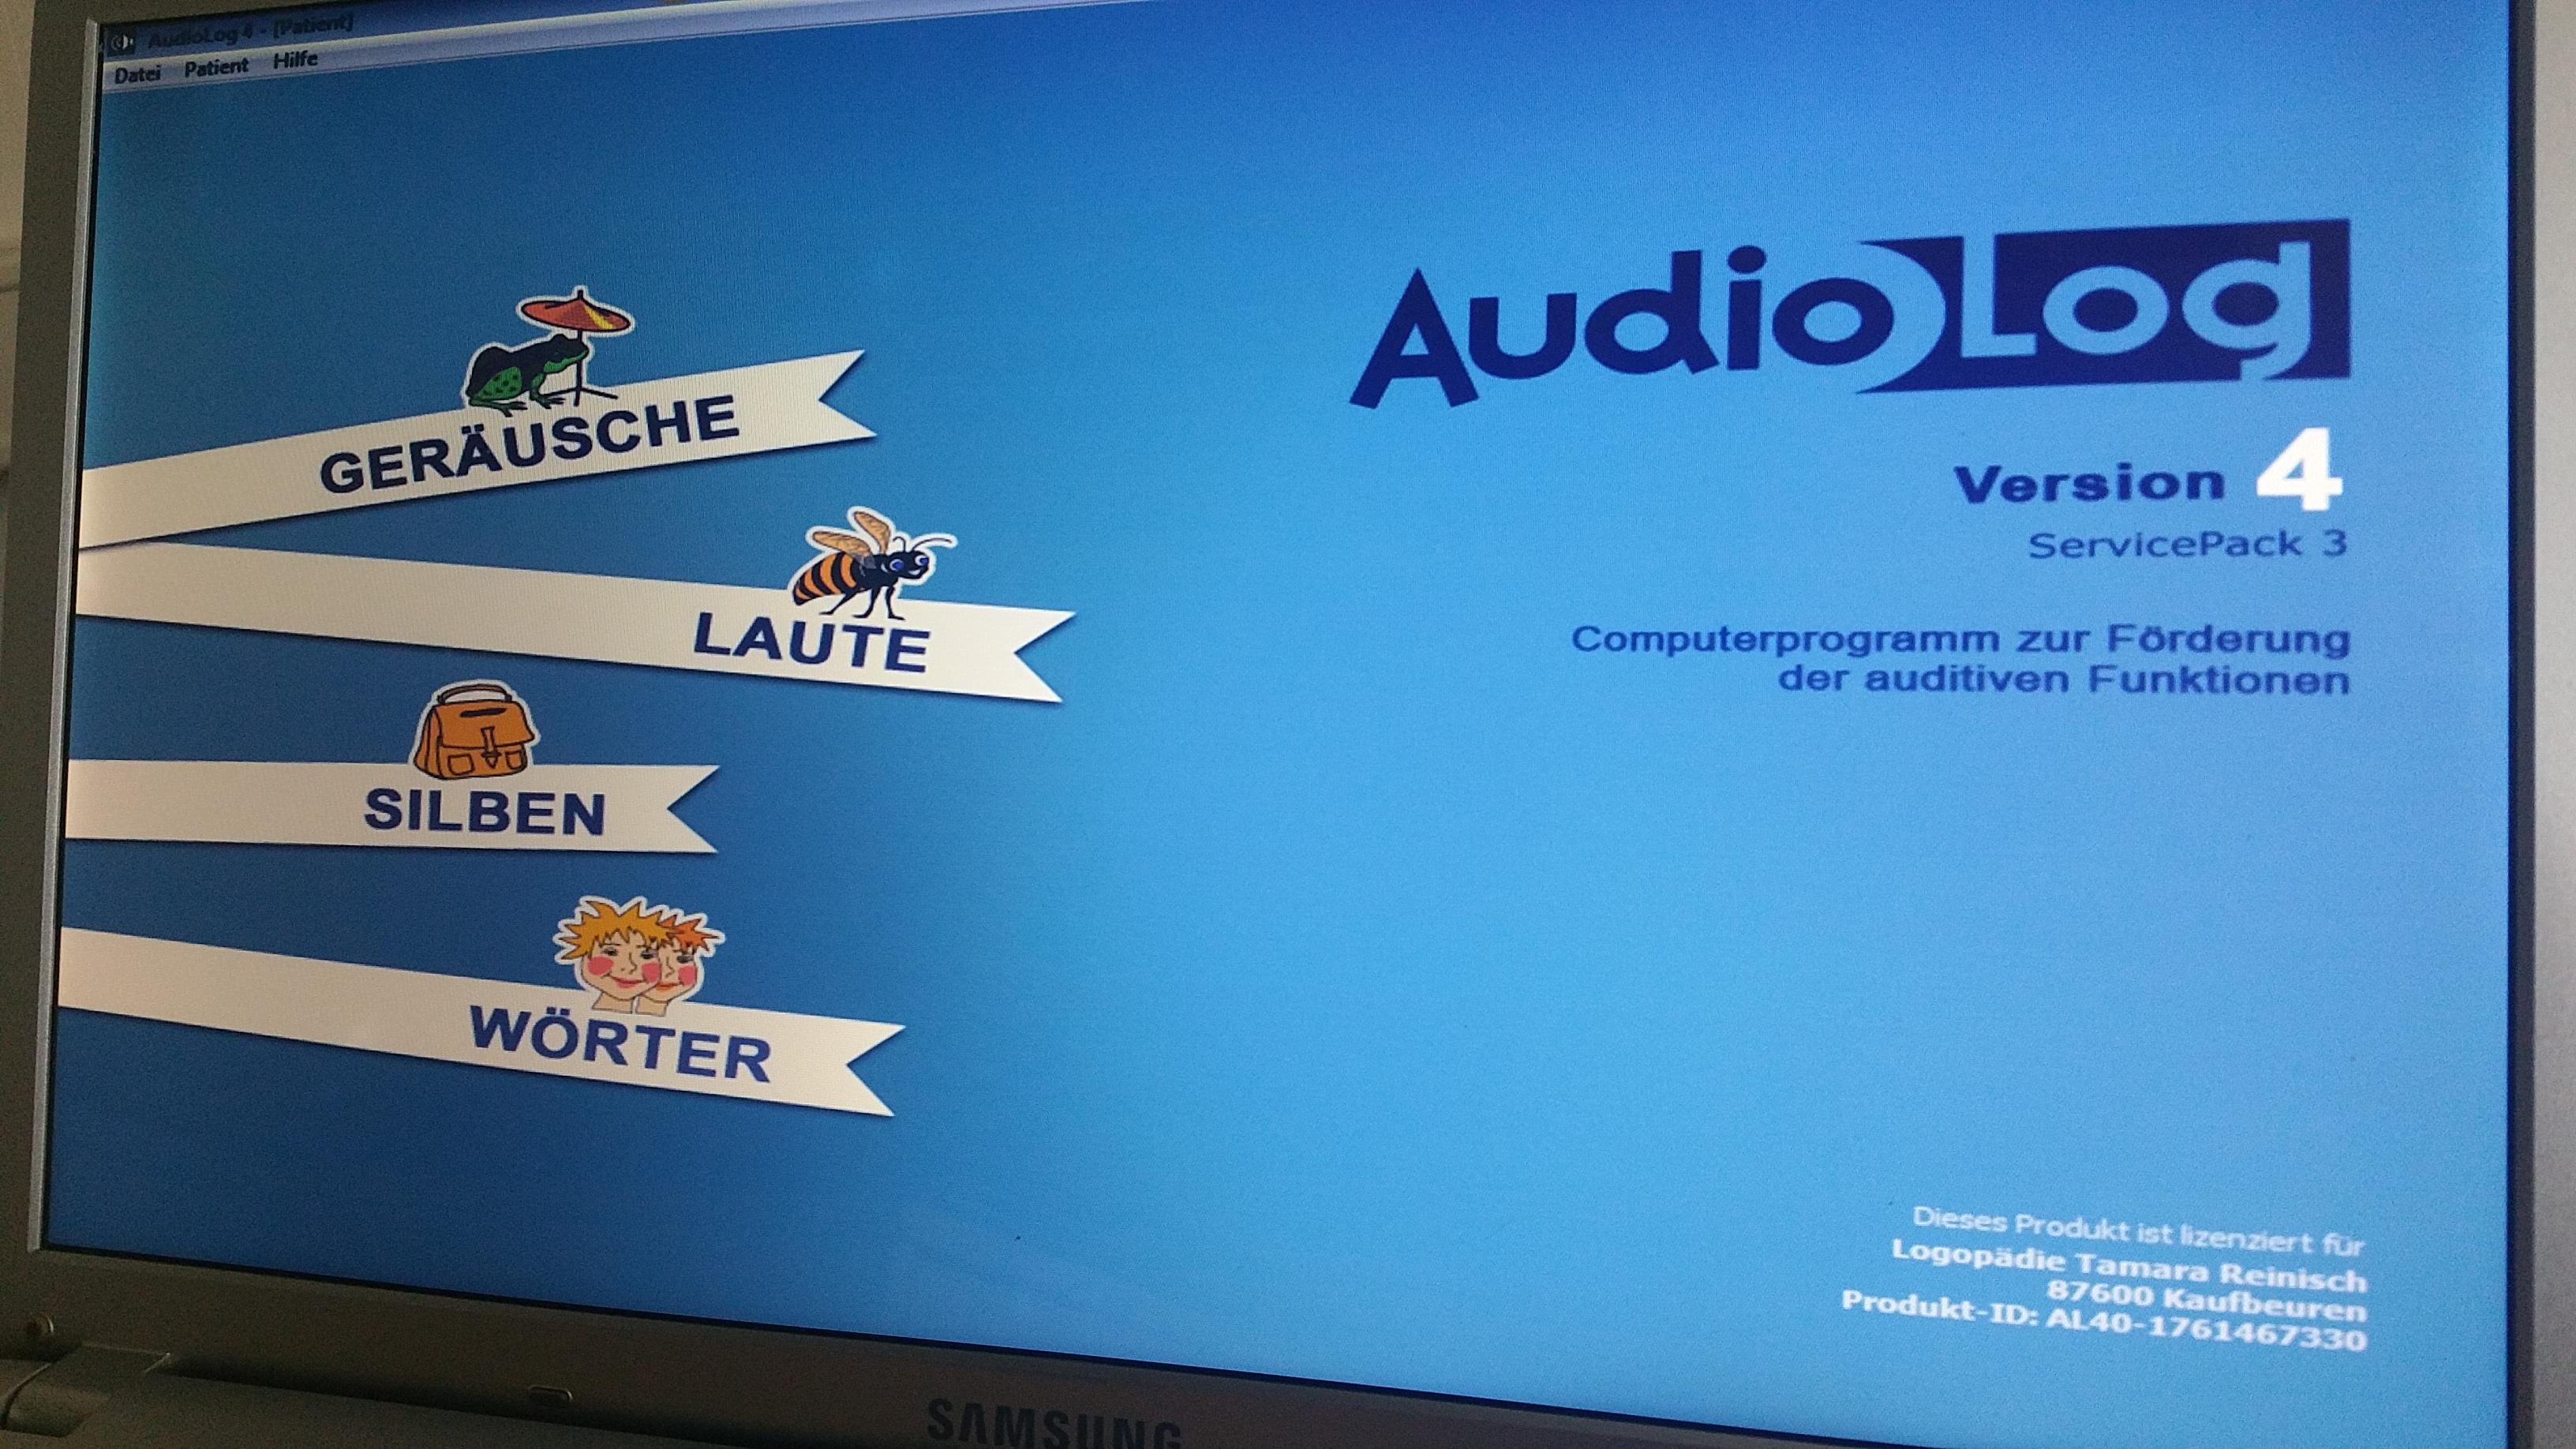 Audiolog, Hörtraining, auditive Wahrnehmung